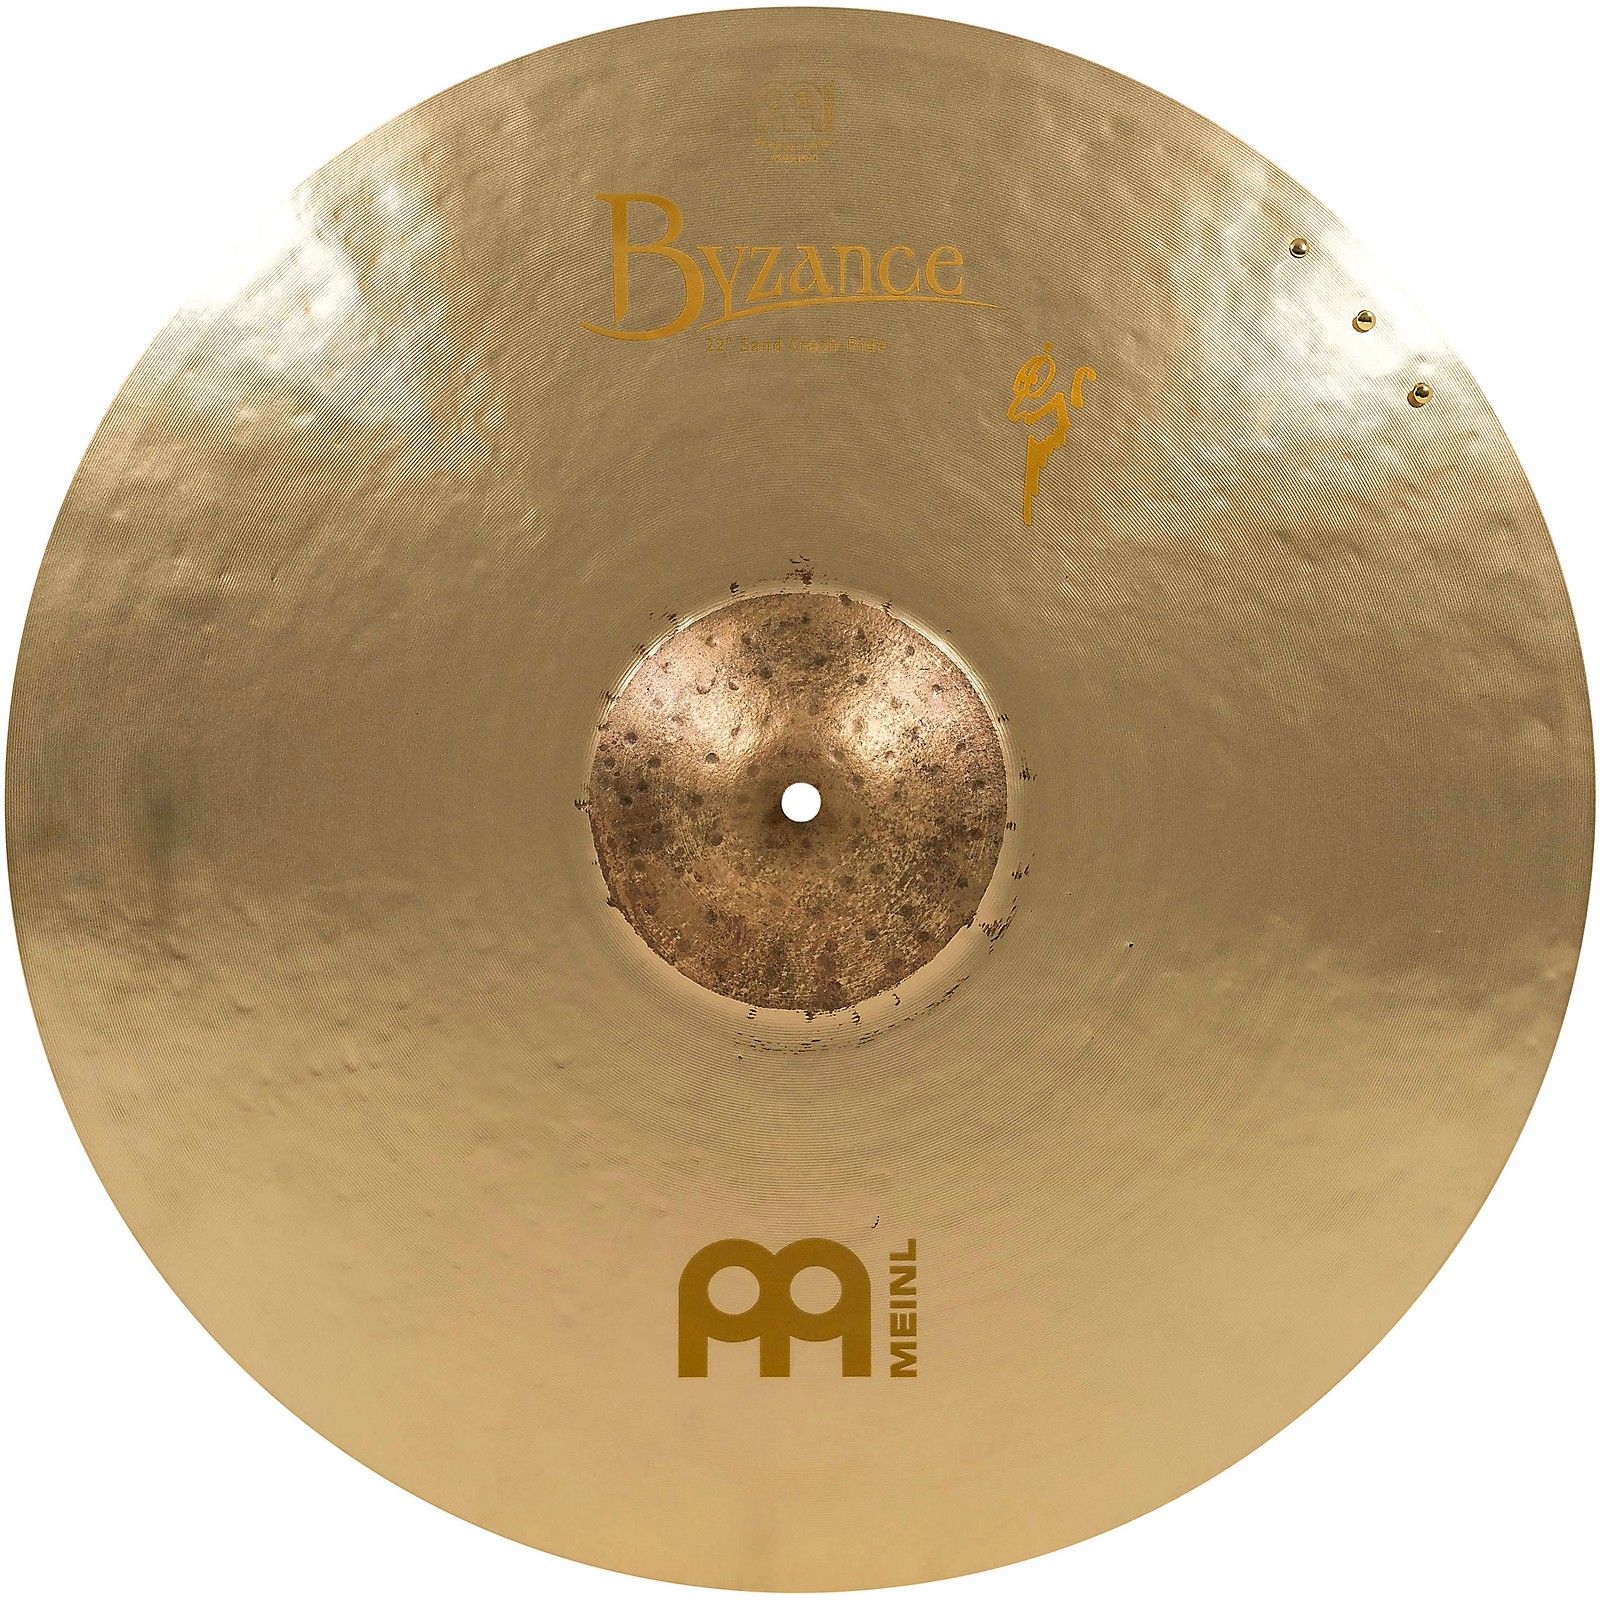 Meinl Byzance Vintage Series Benny Greb Sand Crash-Ride Cymbal